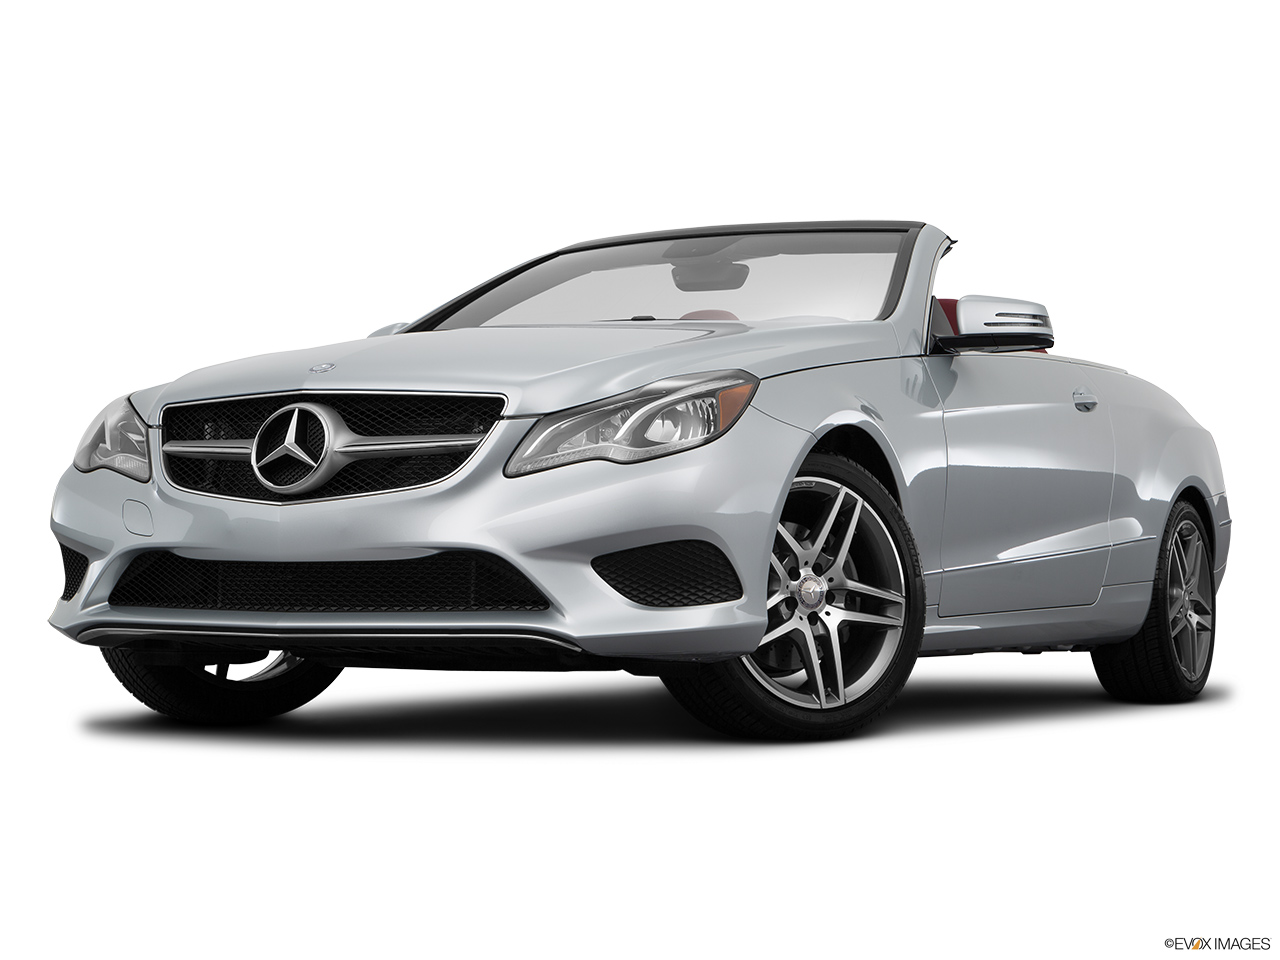 Car pictures list for mercedes benz e class cabriolet 2016 for Mercedes benz list